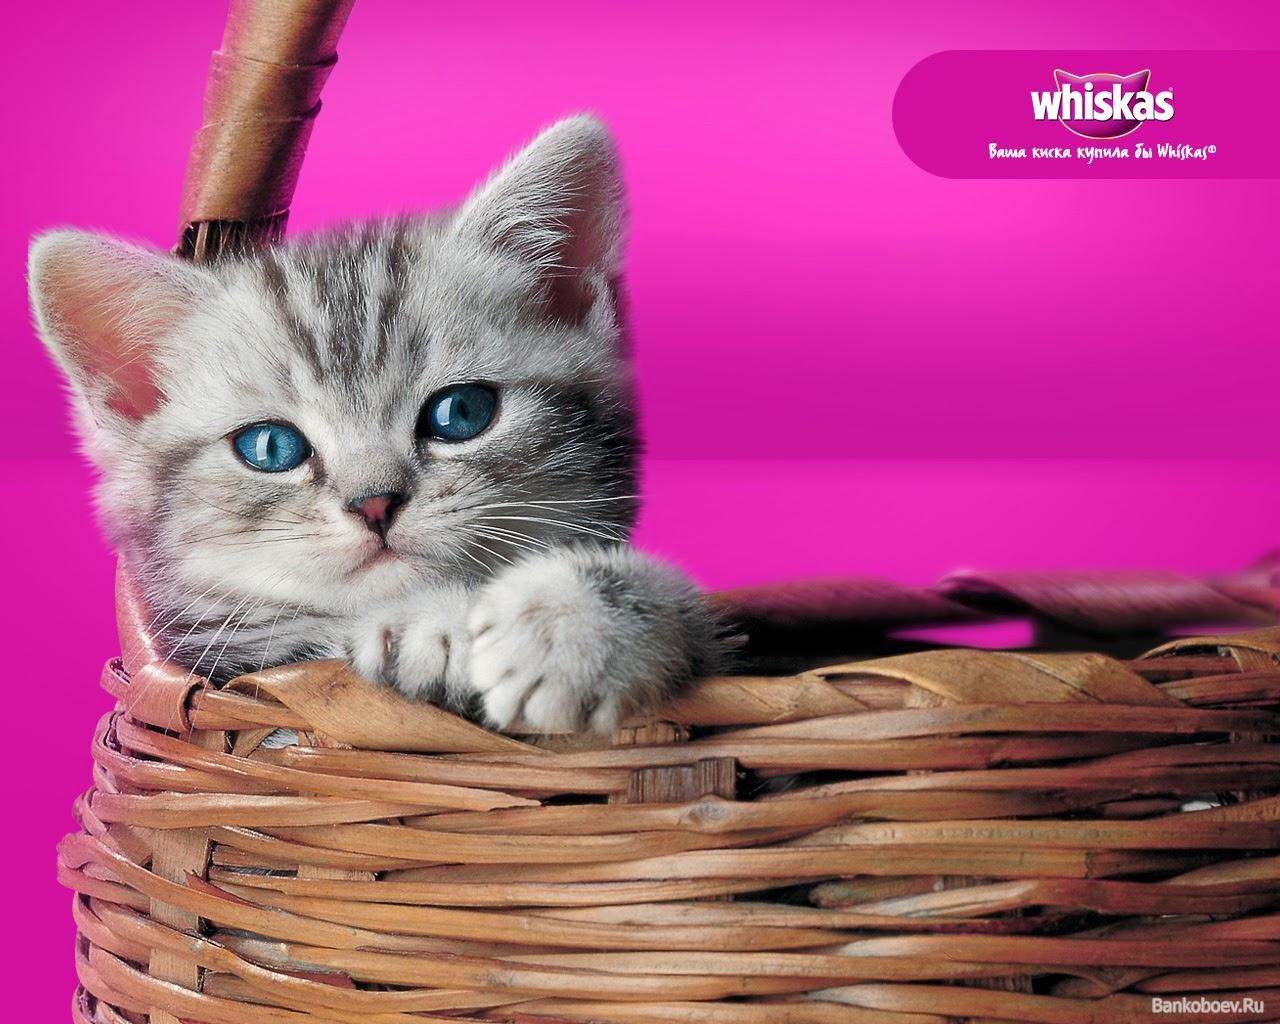 Namun pada postingan kali ini kita akan memfokuskan pada makanan kucing Whiskas Junior Kitten